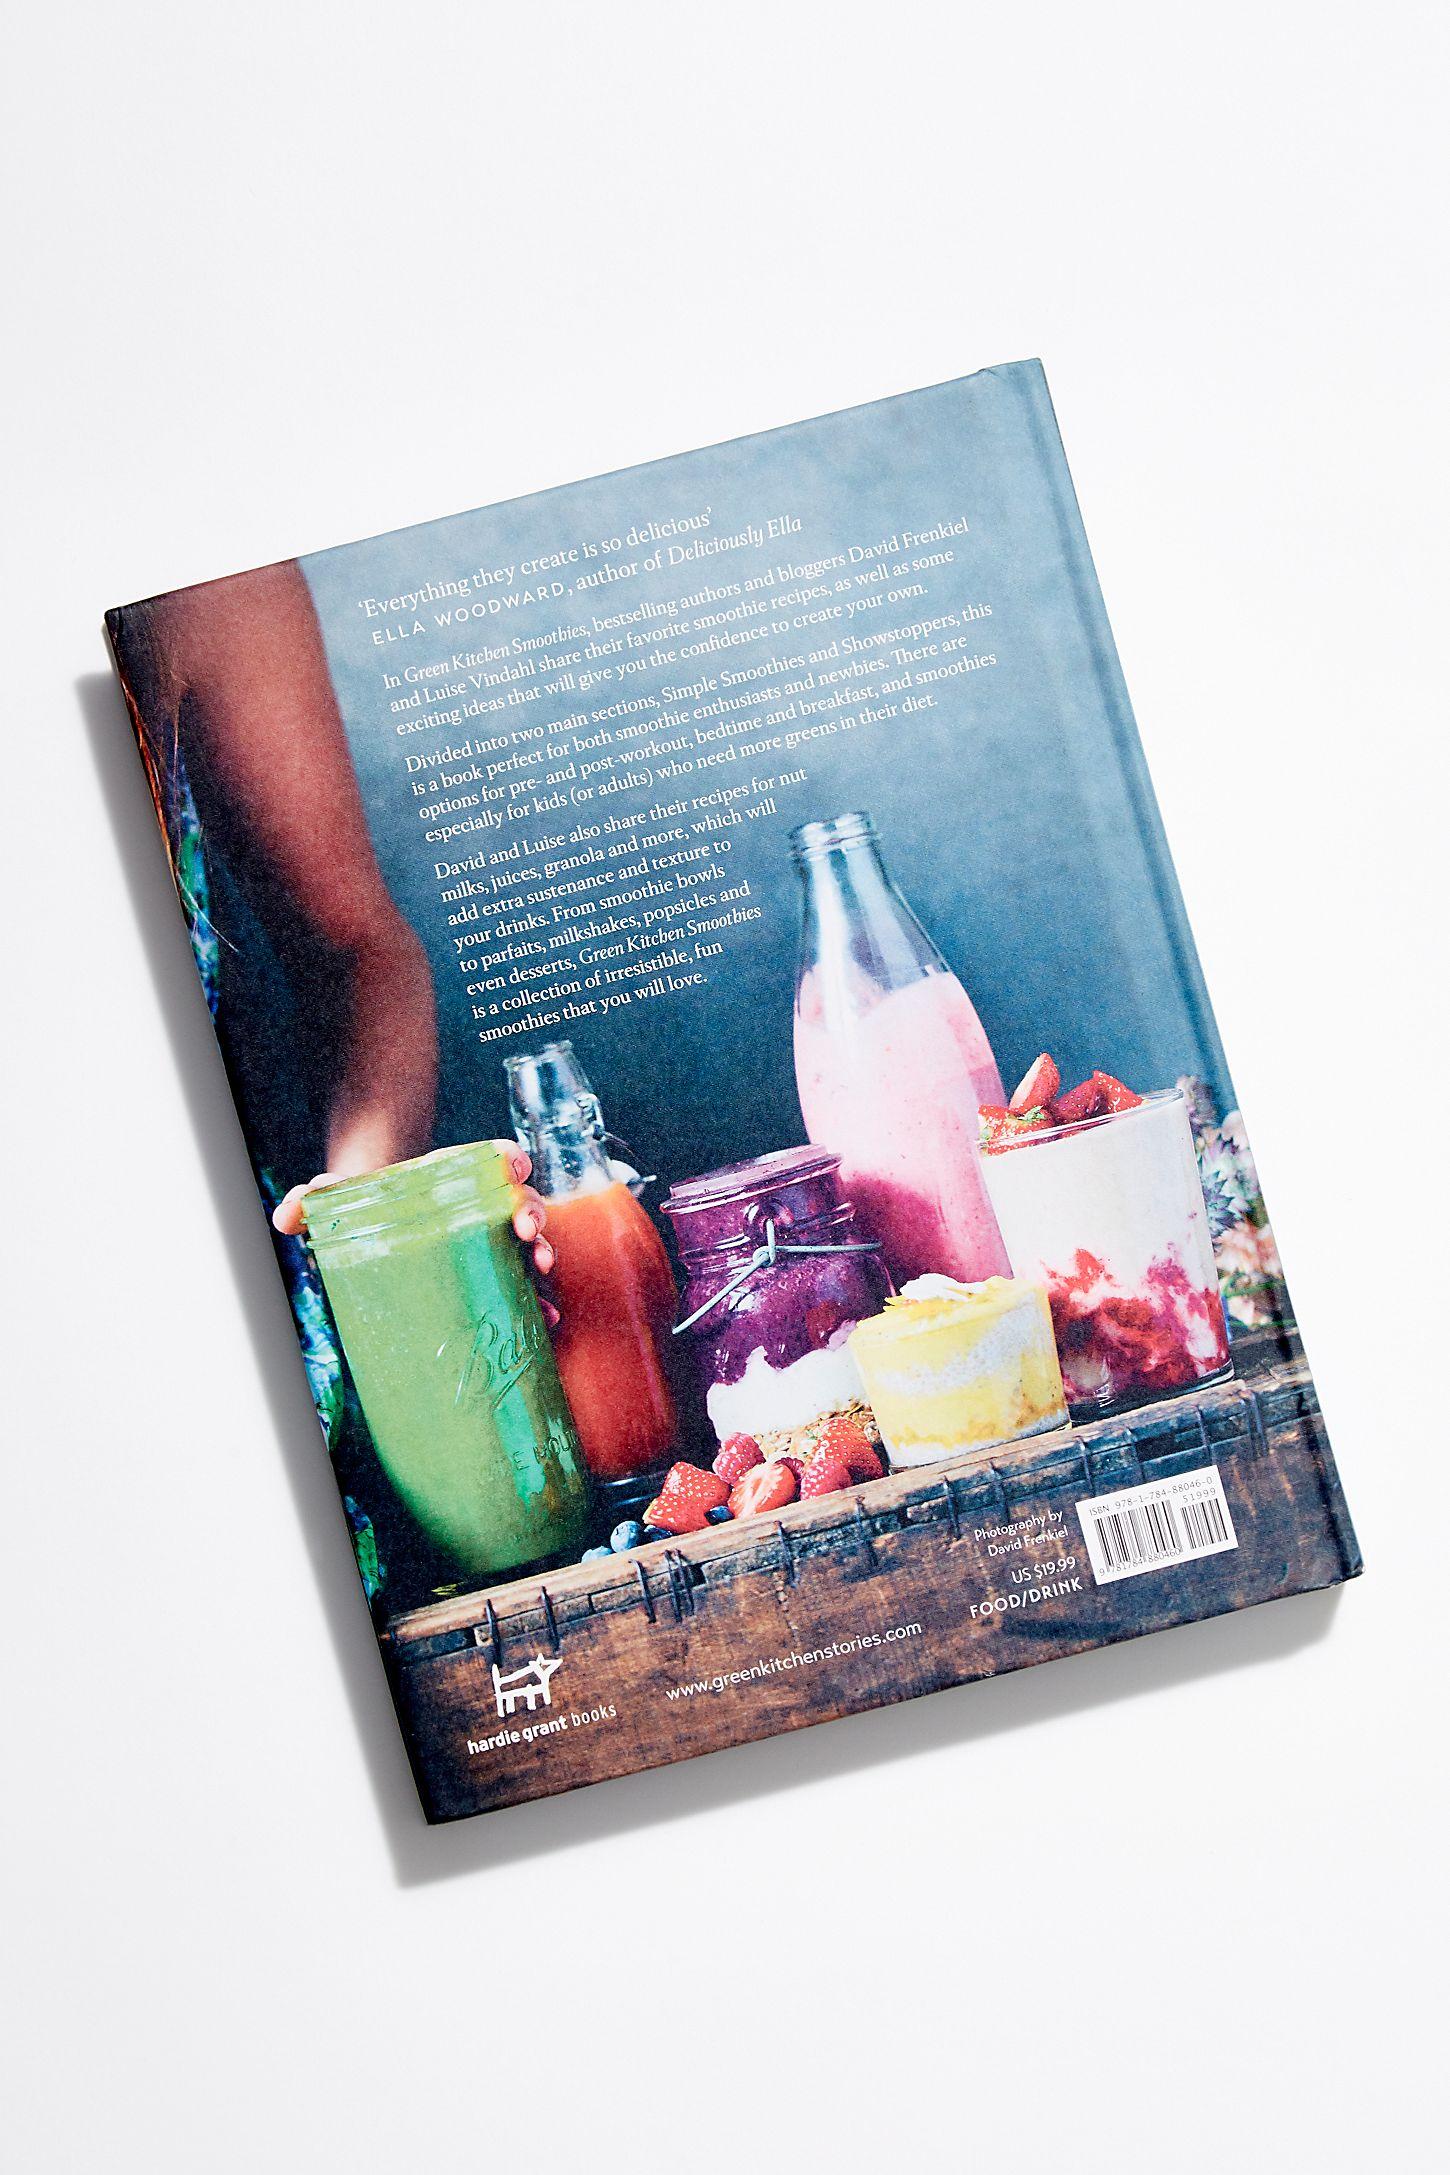 Green Kitchen Smoothies | Free People